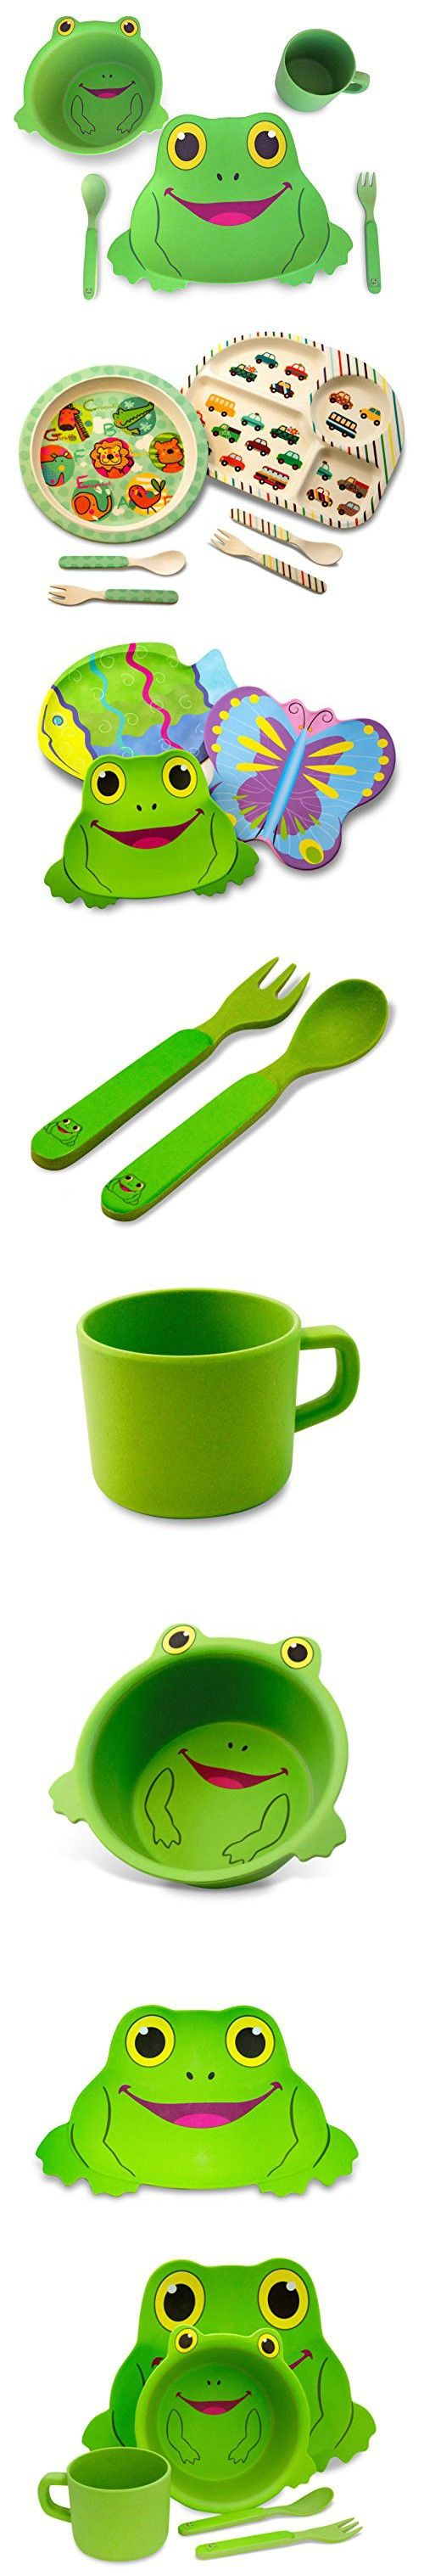 Culina Kids Bamboo 5-piece Dinnerware Set - Frog  sc 1 st  Pinterest & Culina Kids Bamboo 5-piece Dinnerware Set - Frog | Dinnerware and ...